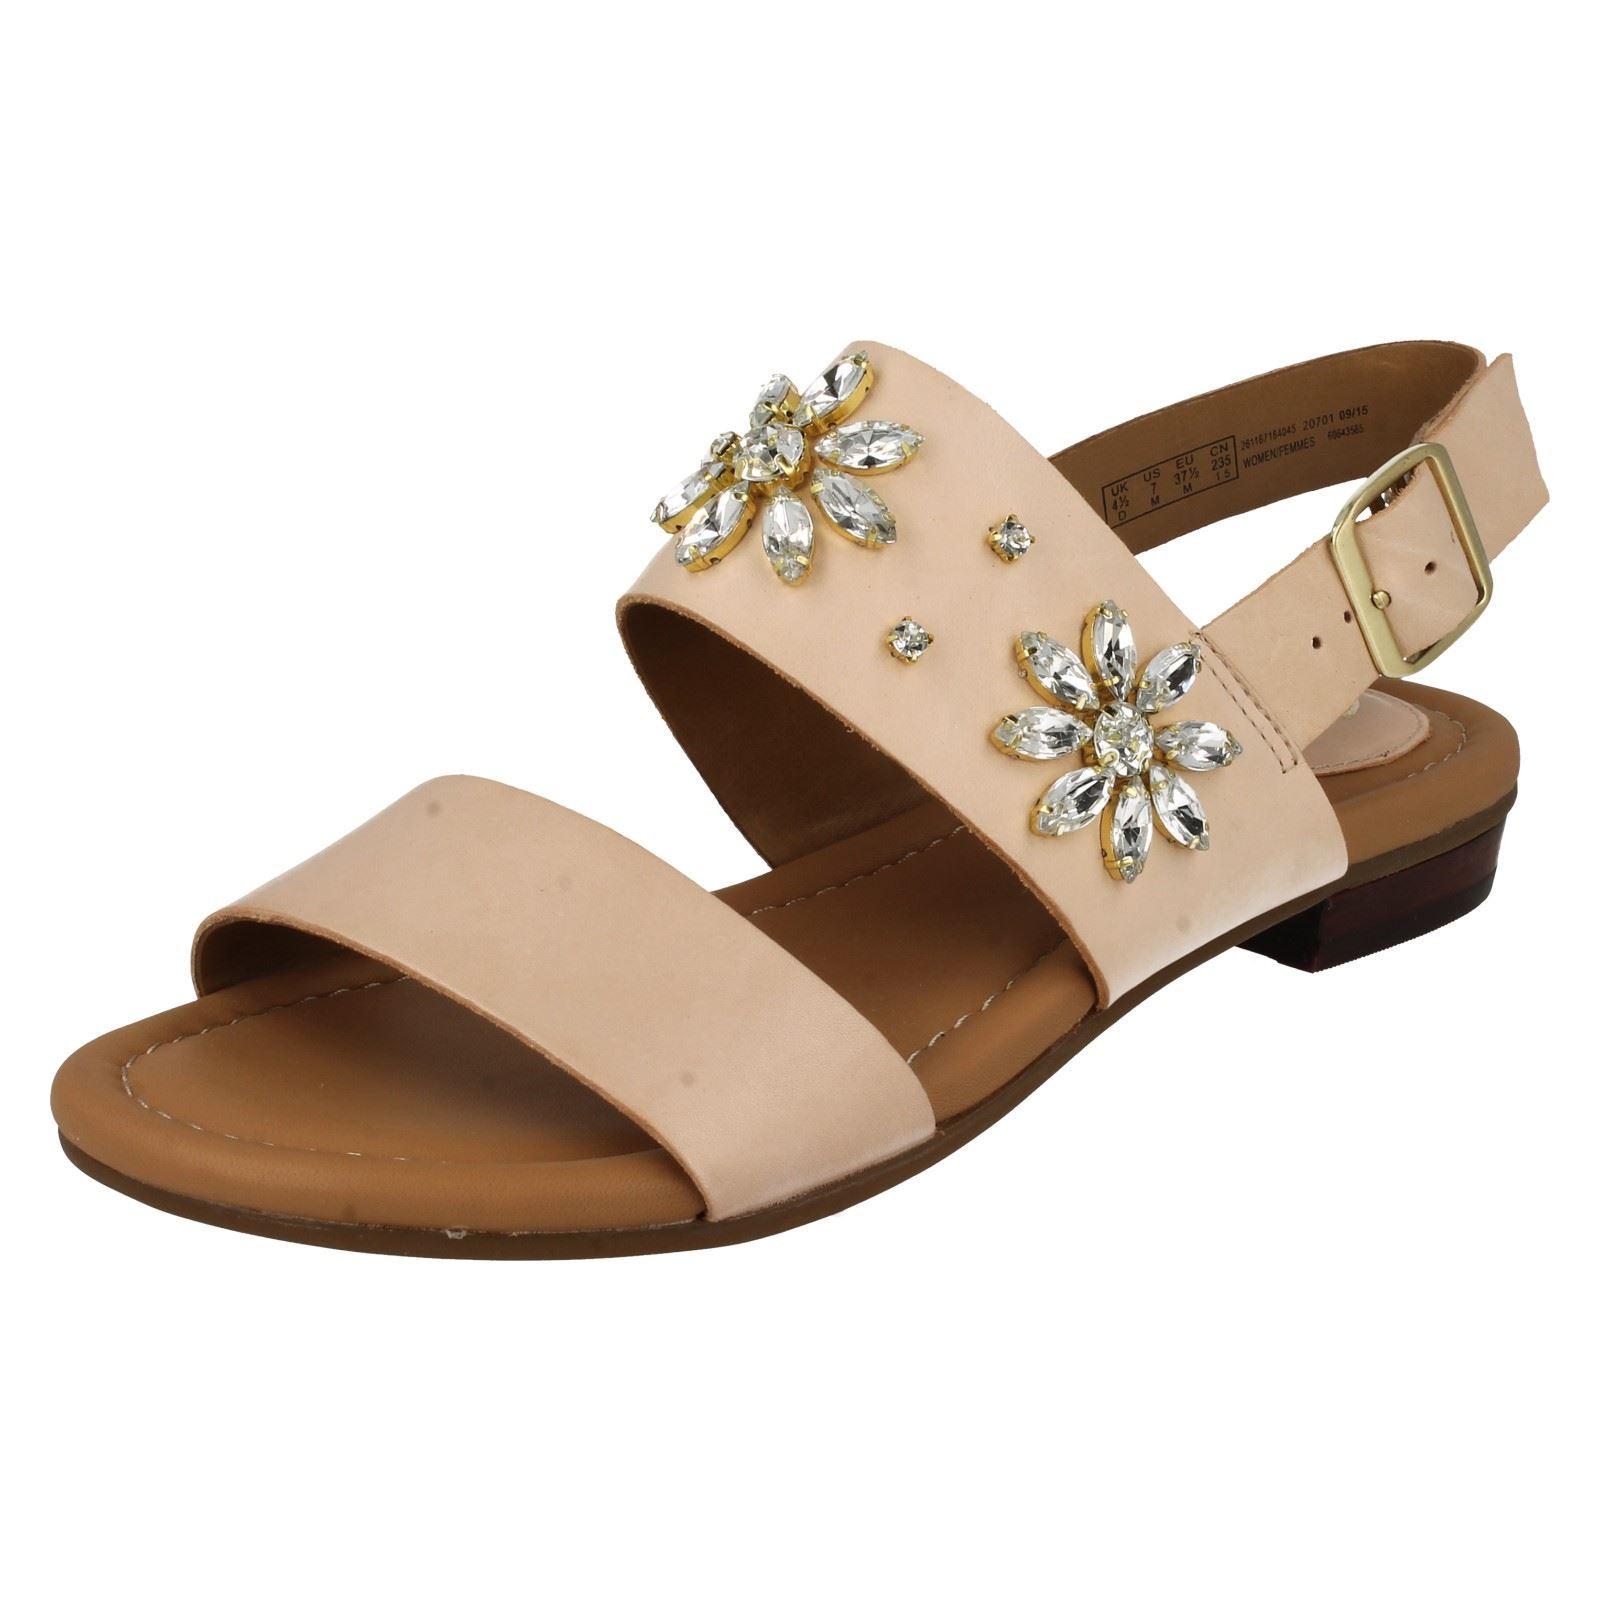 dcb0b72dfe68 Details about Ladies Clarks Viveca Melrose Bead Design Sandals